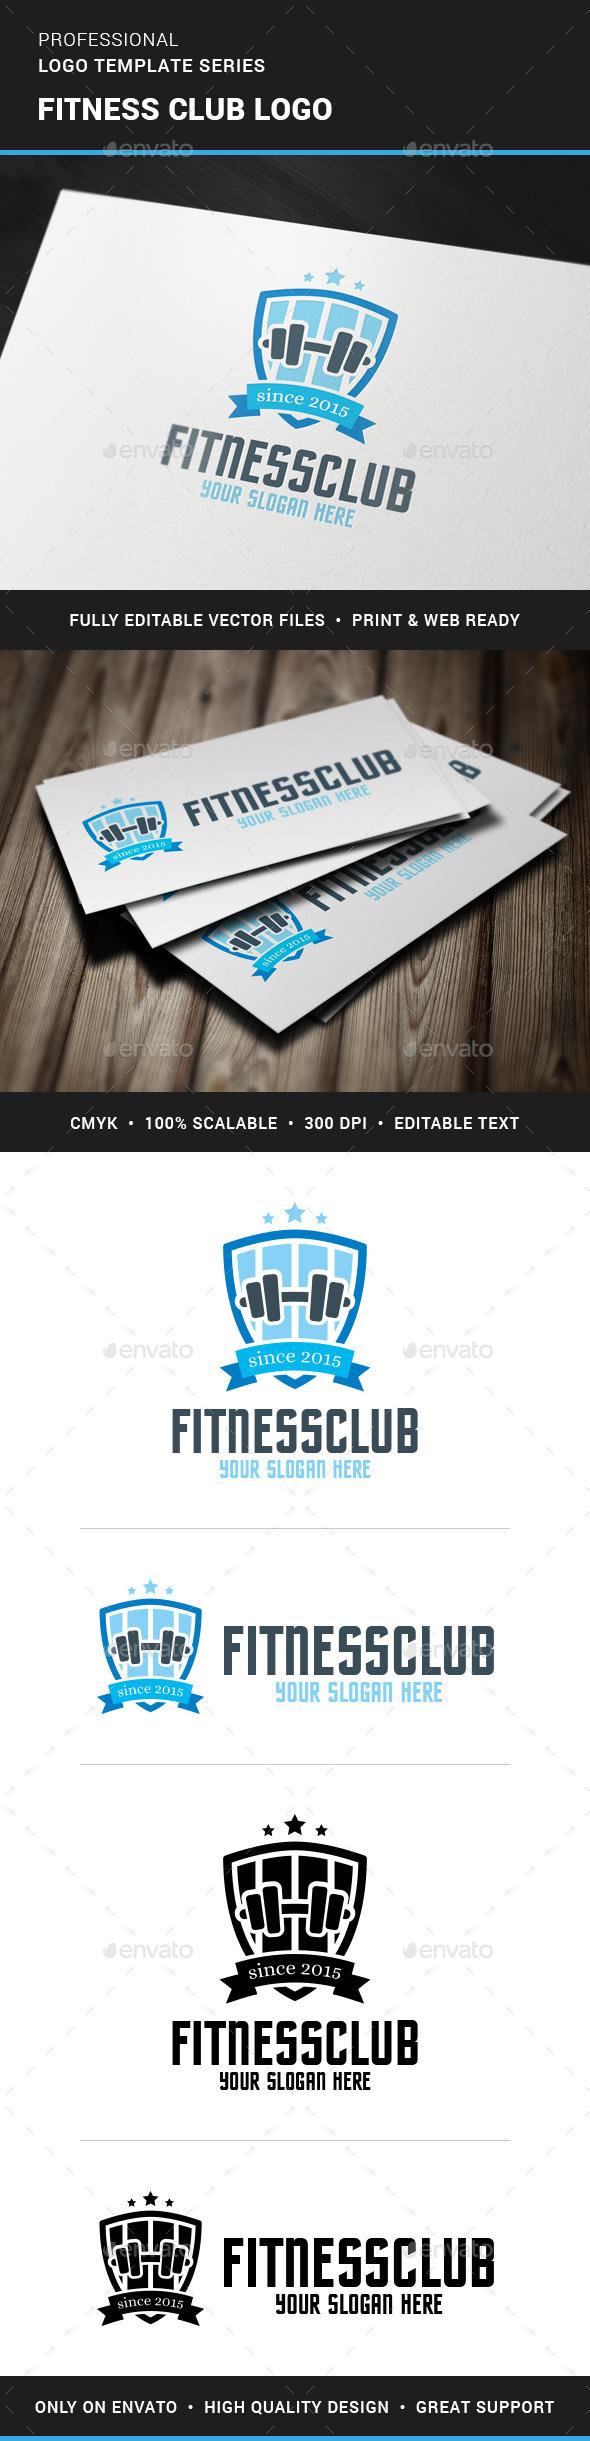 GraphicRiver Fitness Club Logo Template 11401735